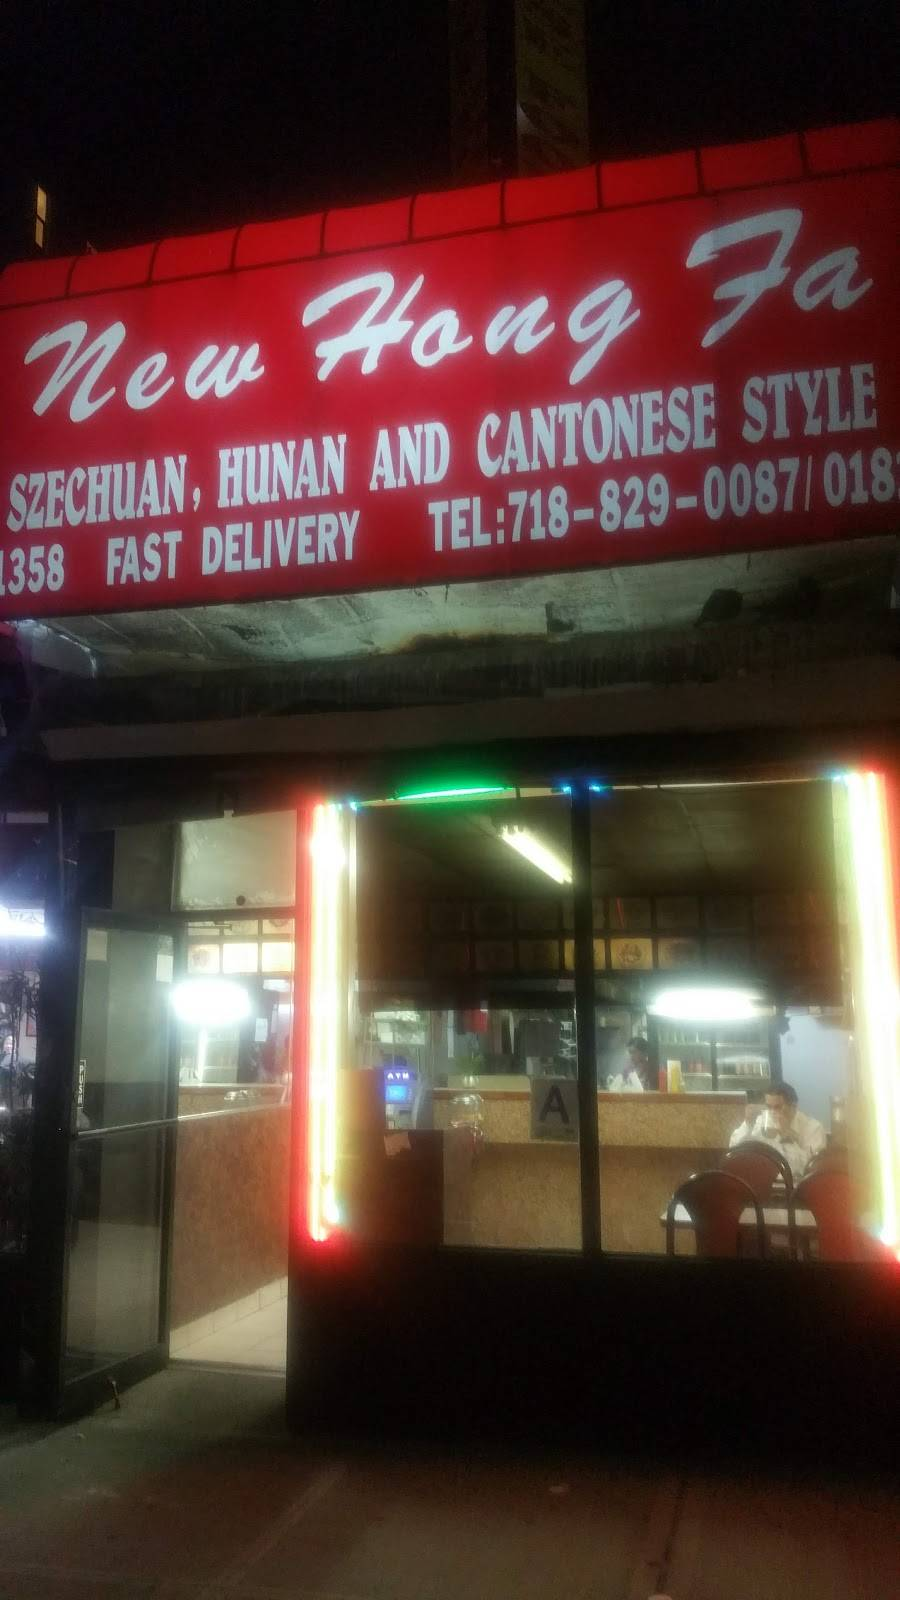 New Hong Fa   restaurant   4102, 1358, White Plains Rd, Bronx, NY 10462, USA   7188290087 OR +1 718-829-0087